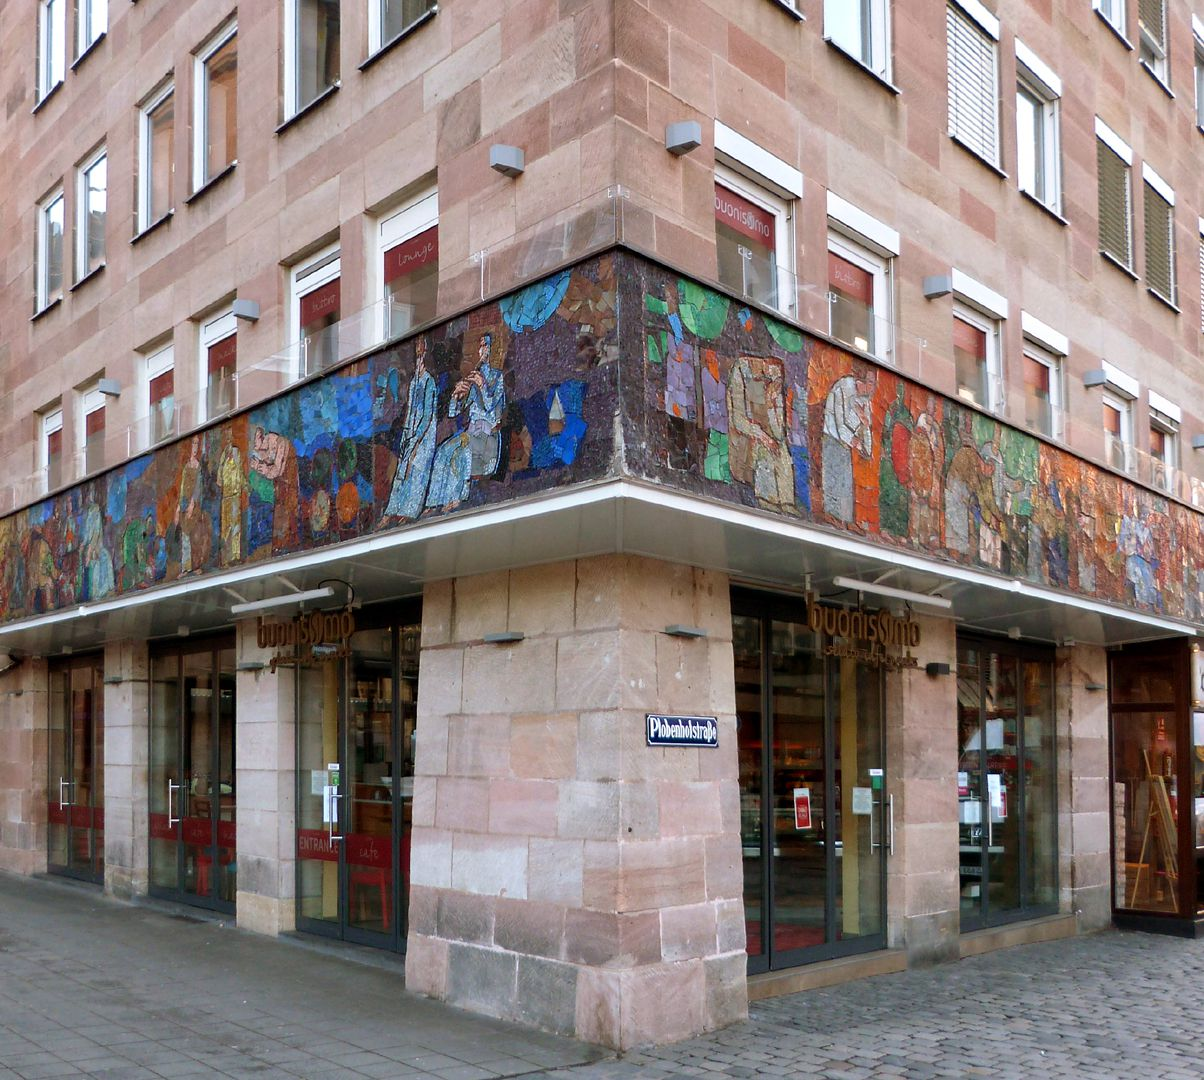 Mosaik am Hauptmarkt in Nürnberg Eckansicht